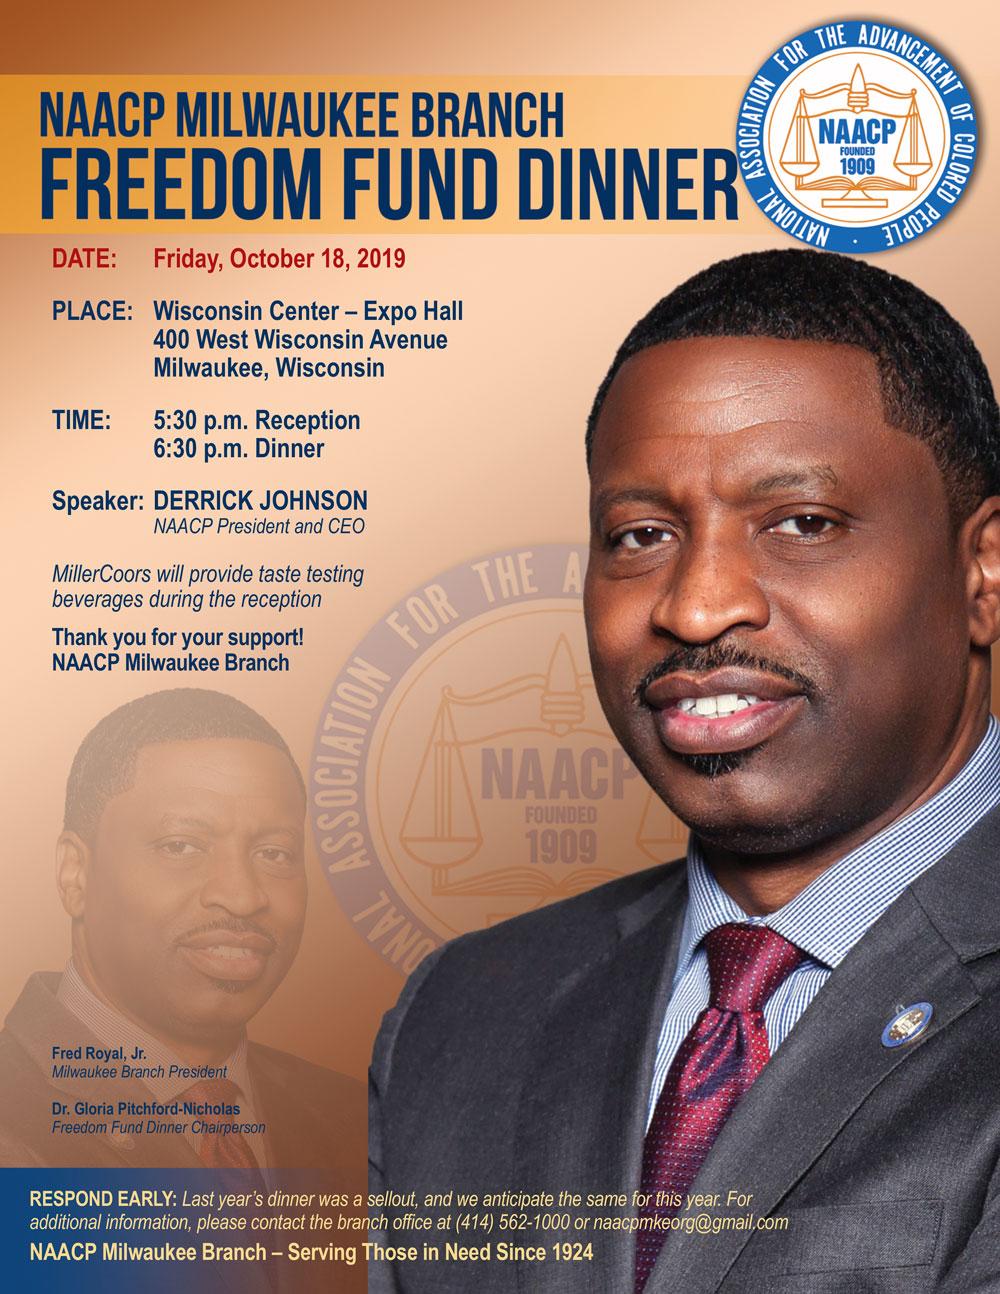 Annual Freedom Fund Dinner